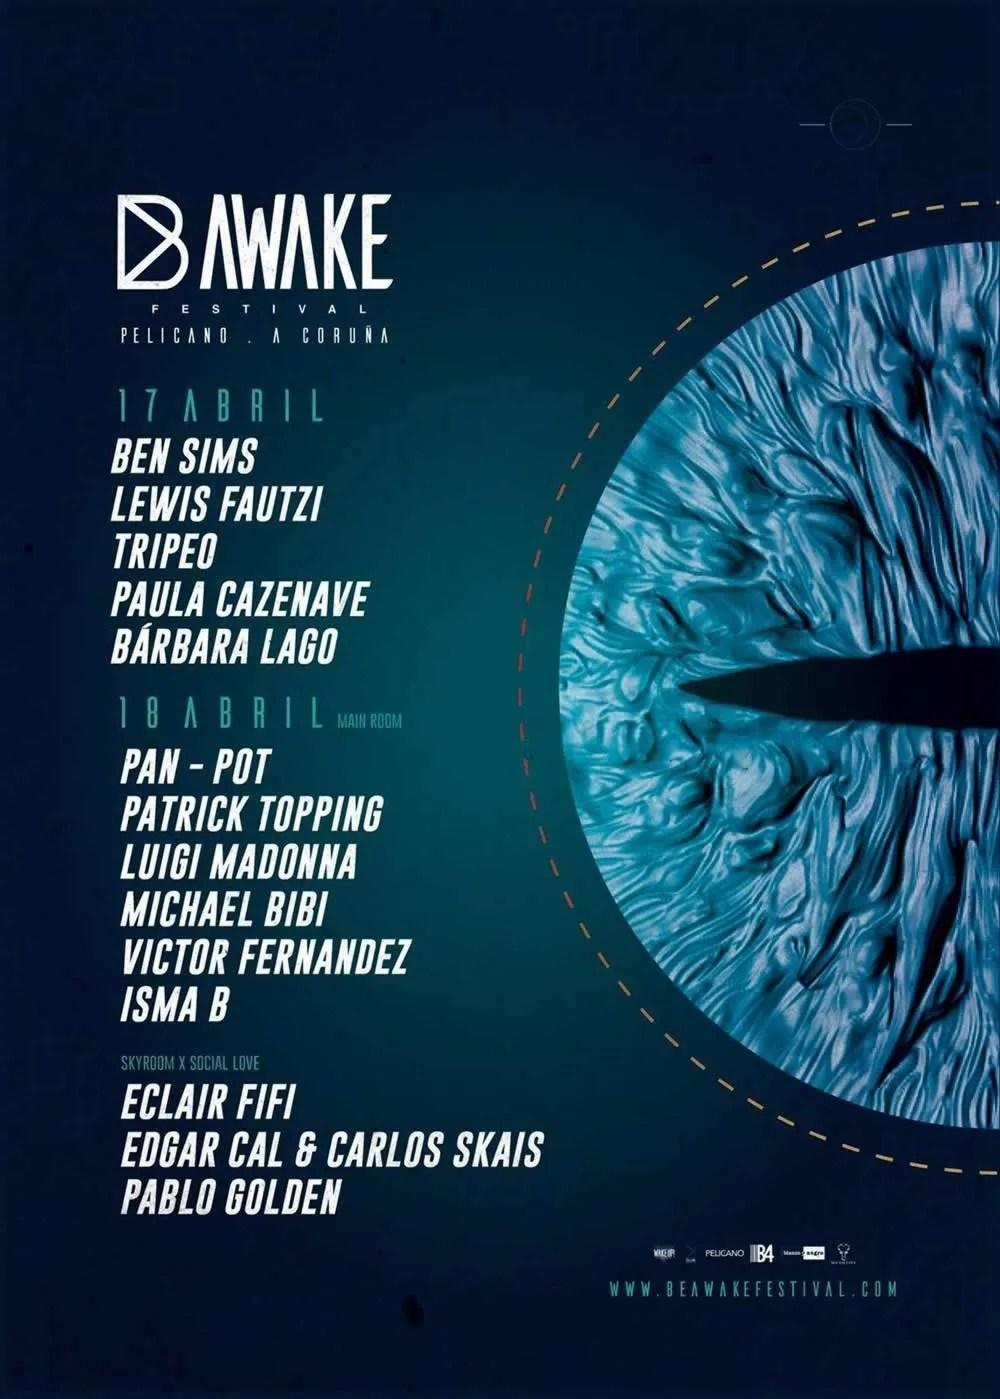 Be Awake Festival 17-18 abril